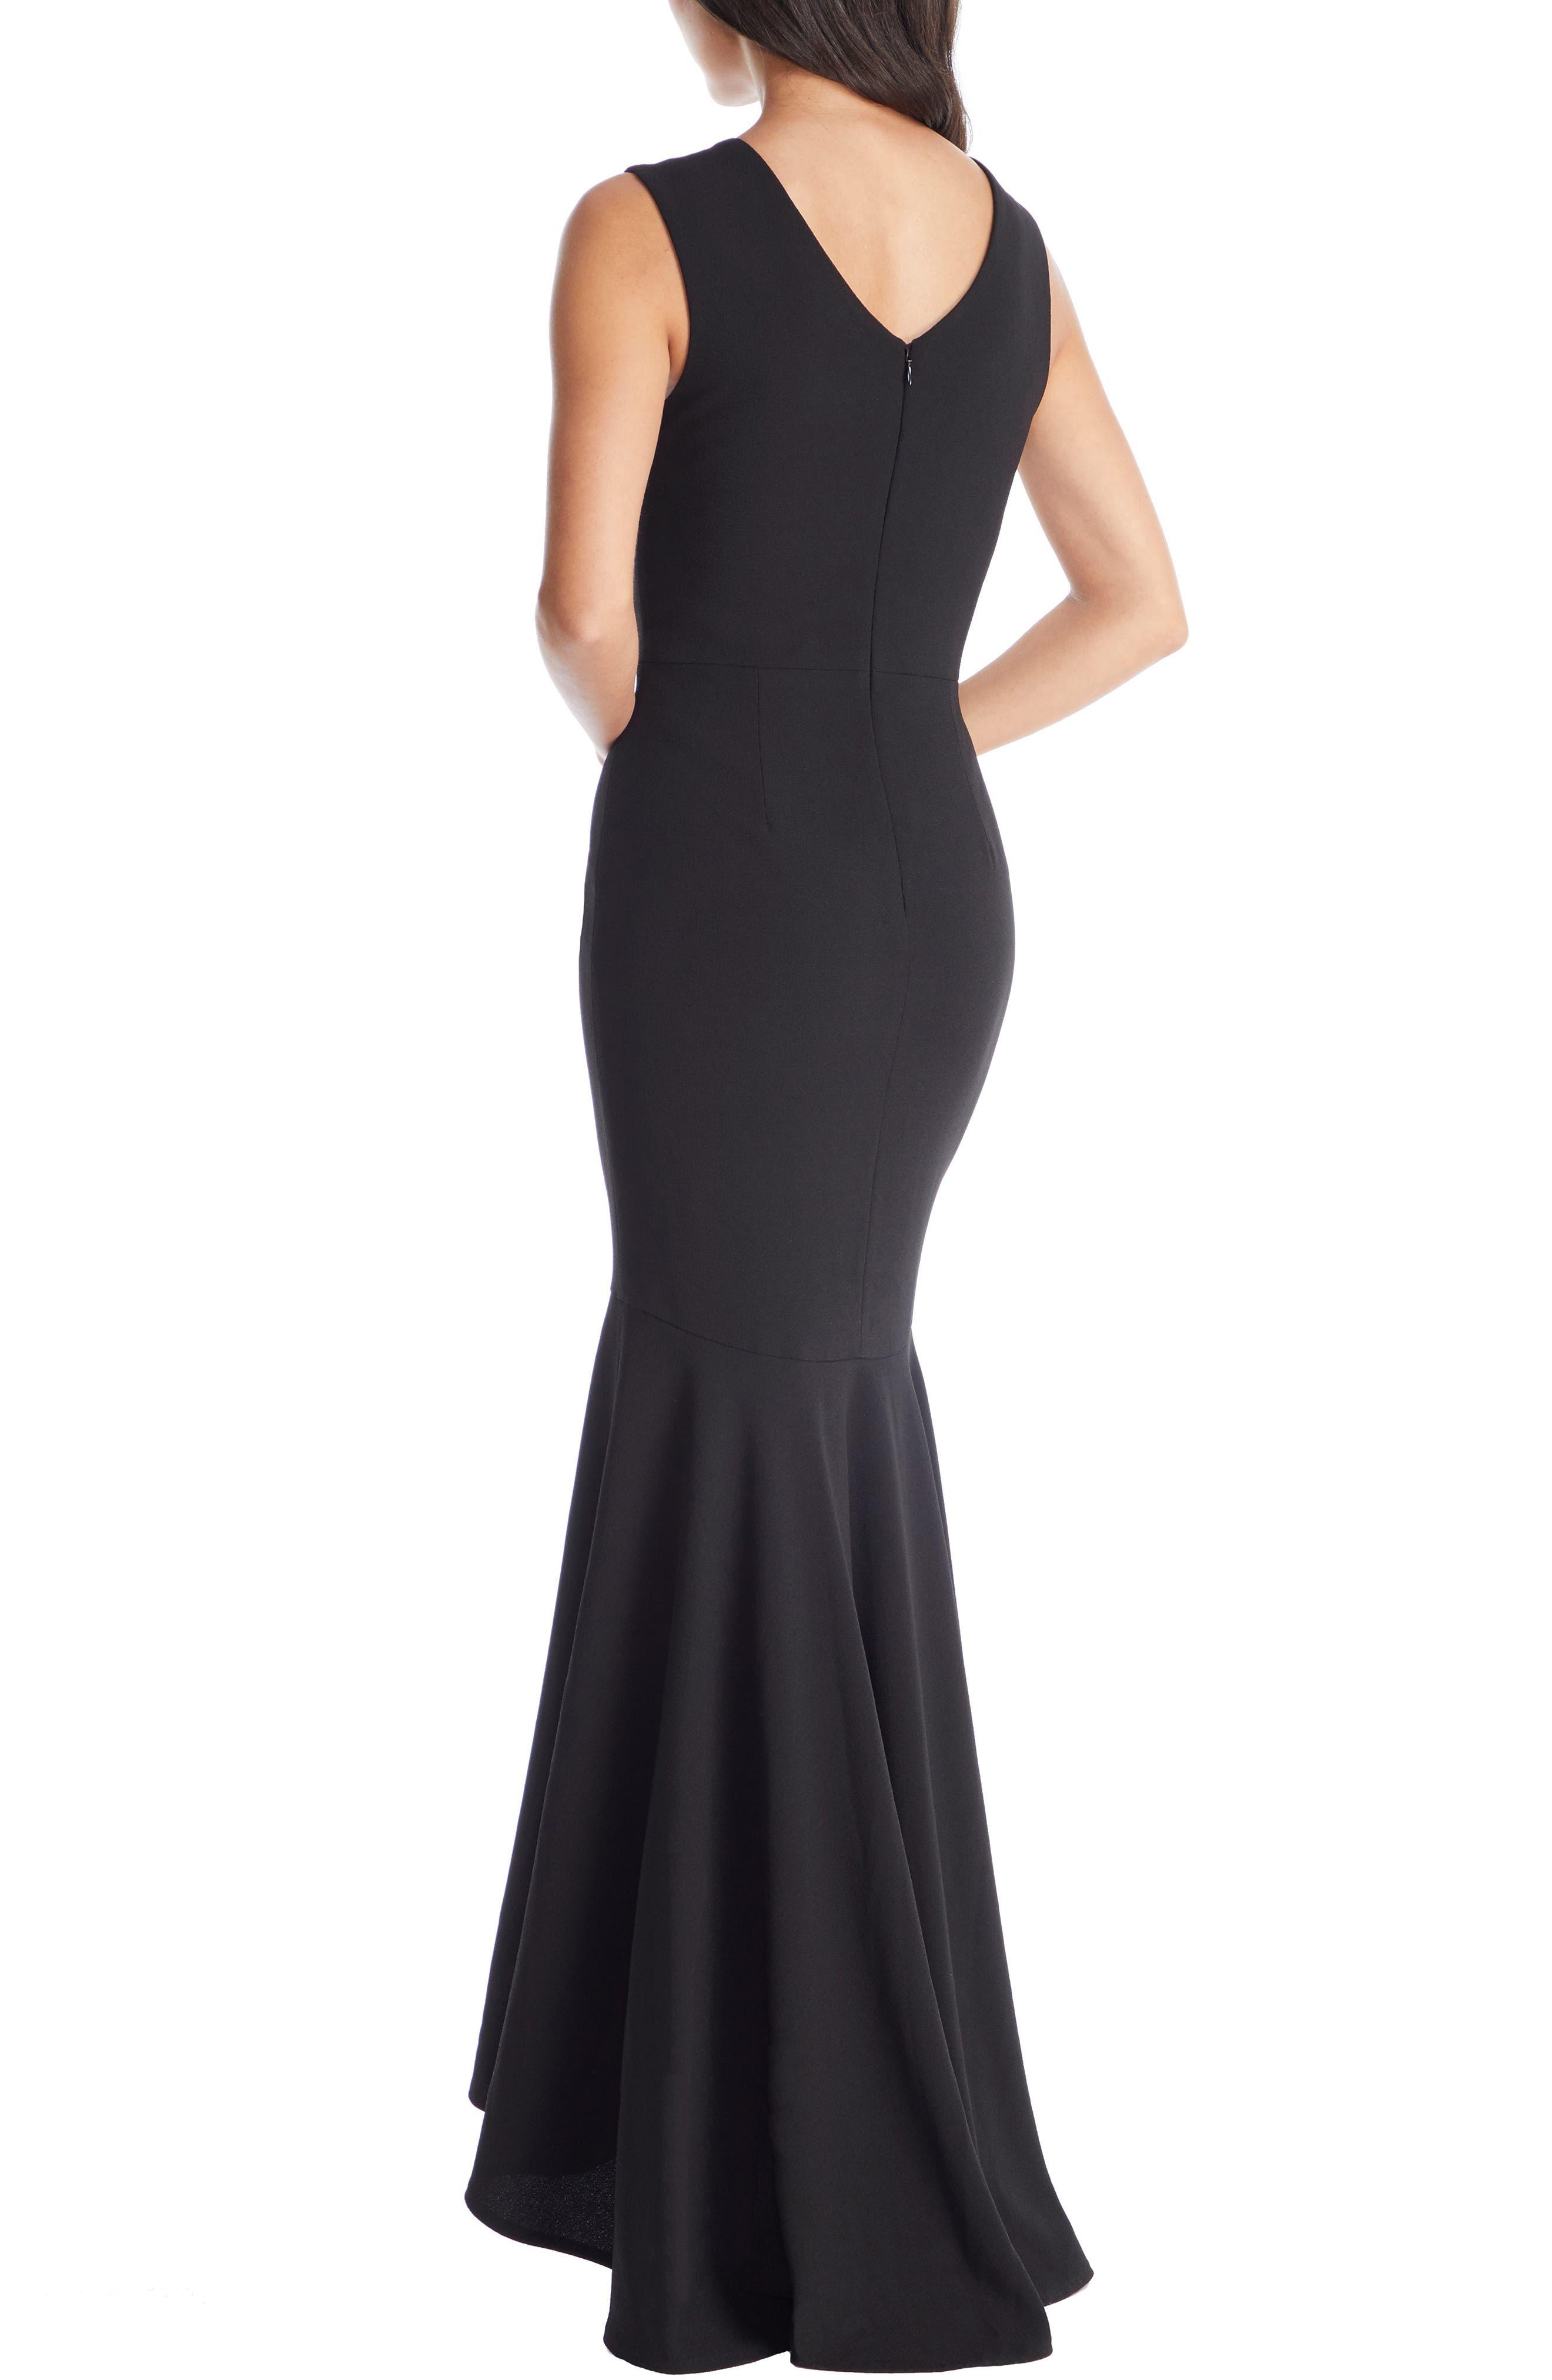 DRESS THE POPULATION, Demi High/Low Mermaid Hem Evening Dress, Alternate thumbnail 2, color, BLACK